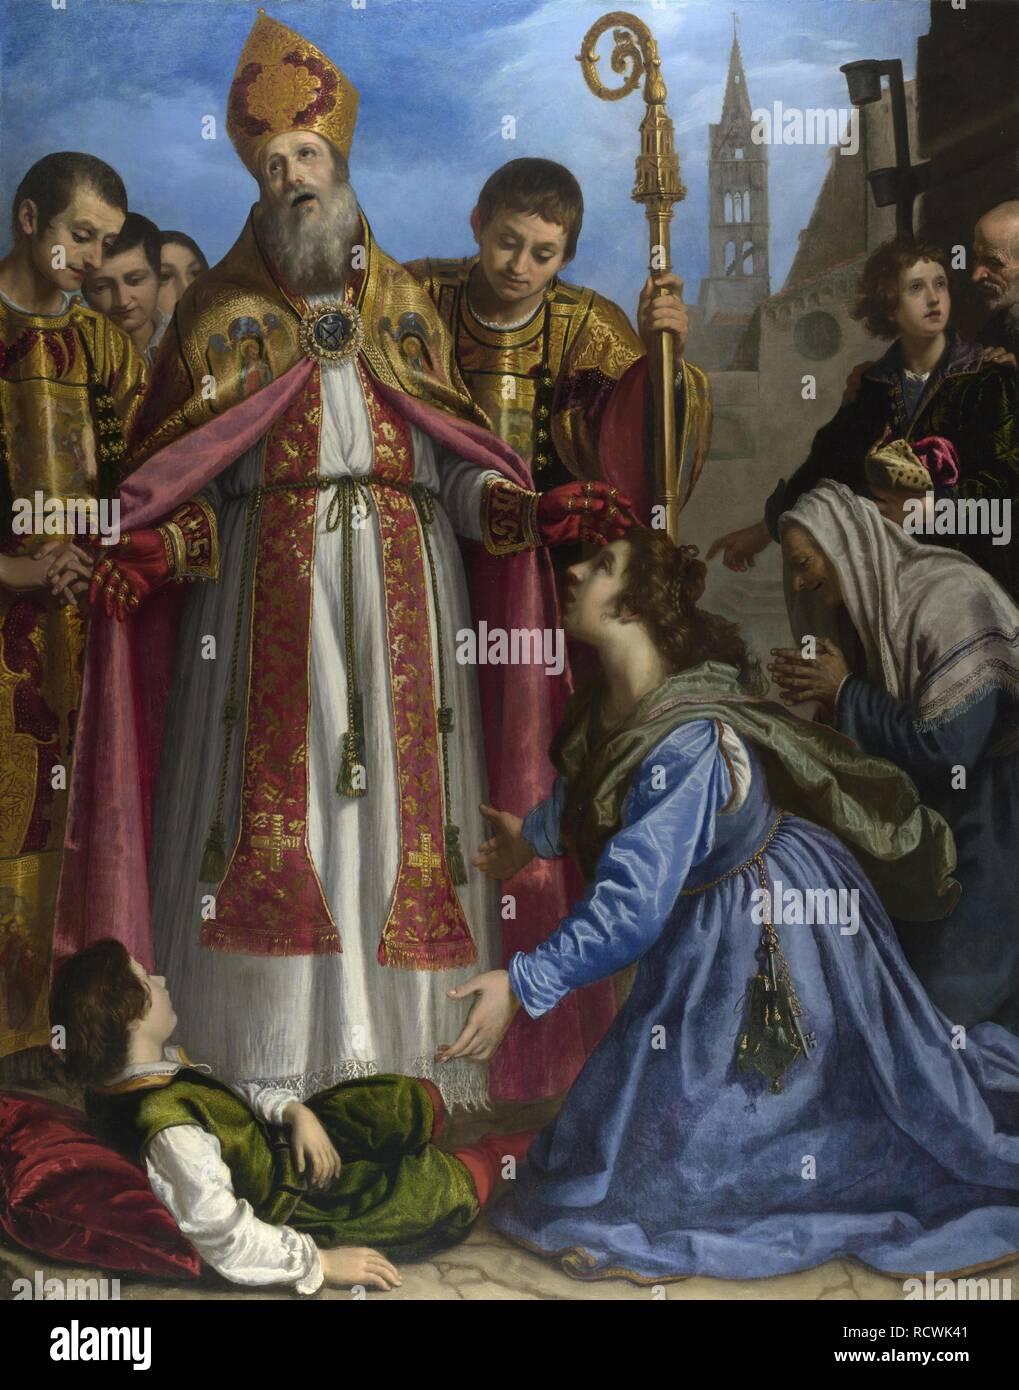 Saint Zenobius revives a Dead Boy. Museum: National Gallery, London. Author: BILIVERT, GIOVANNI. - Stock Image